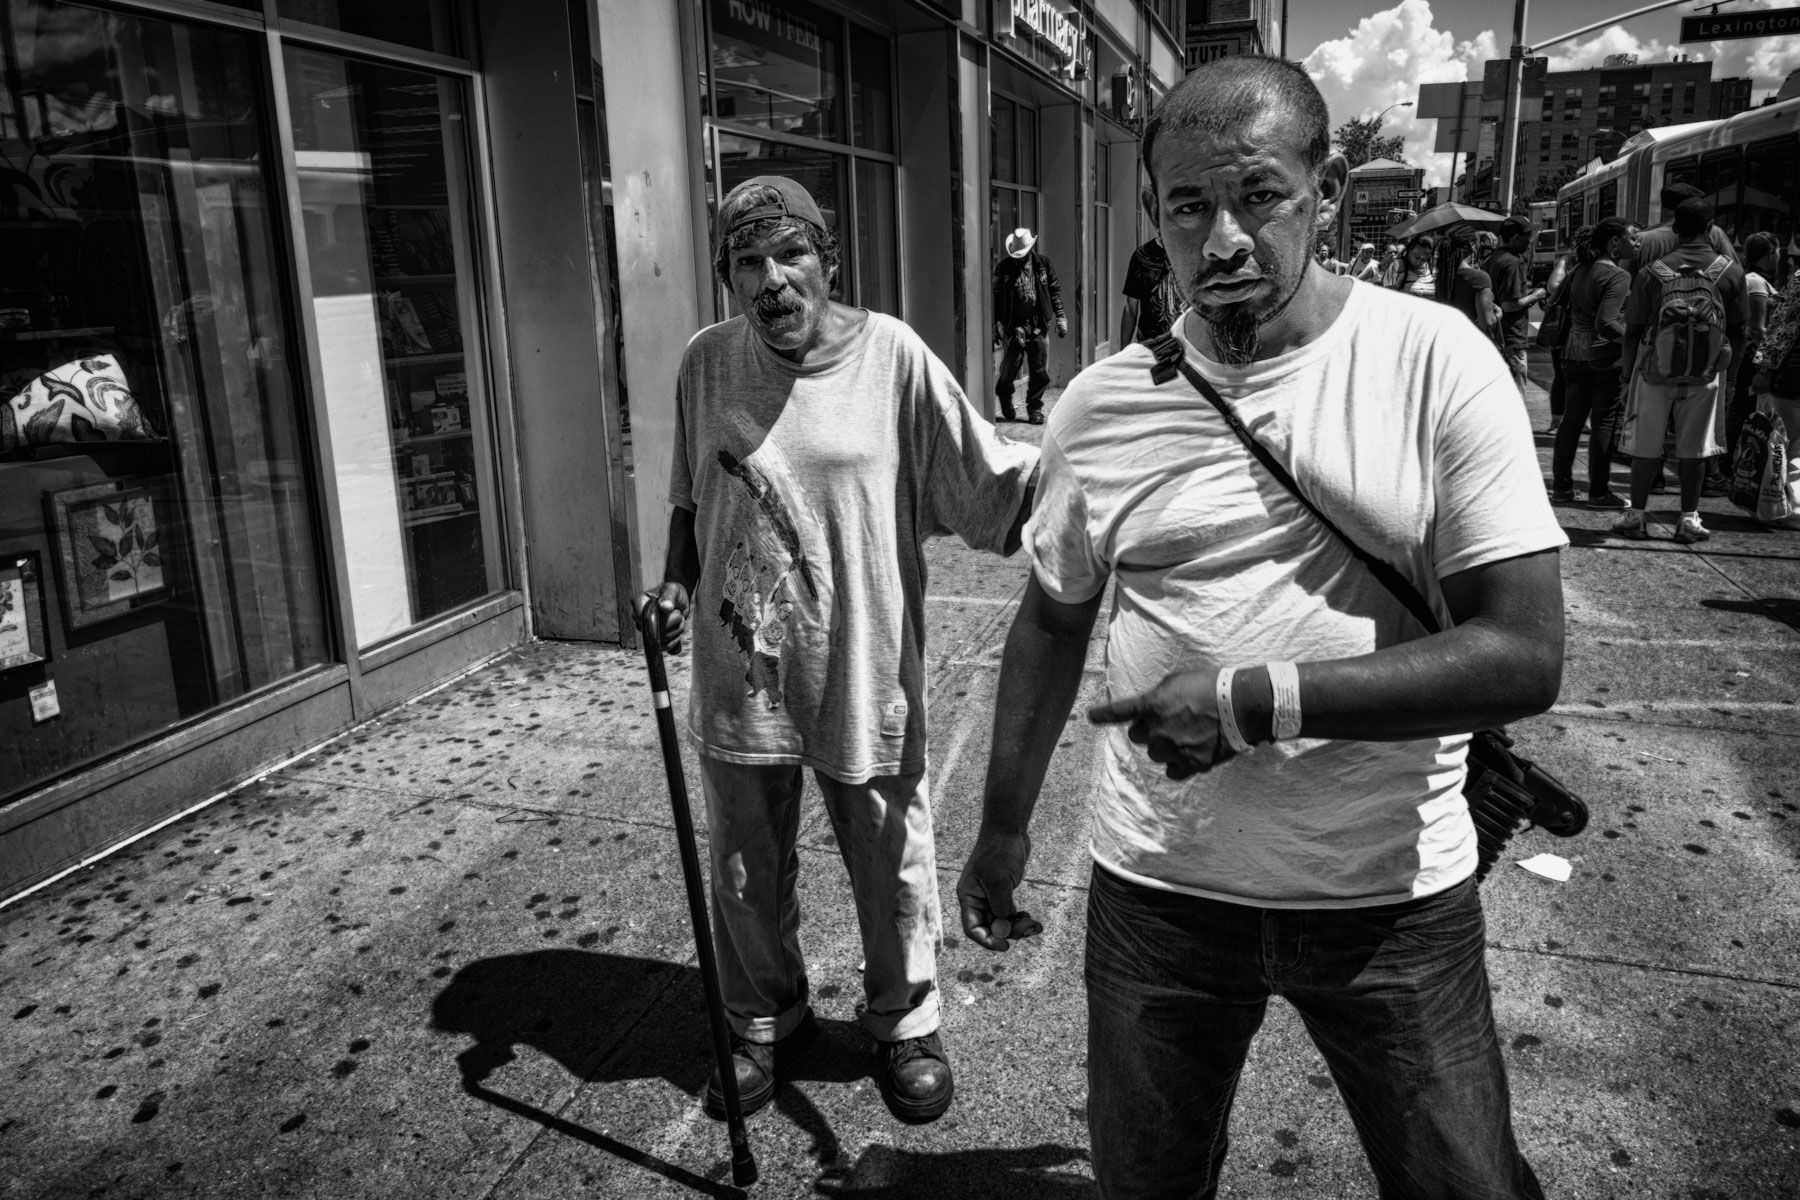 Manhattan, New York  08/04/13